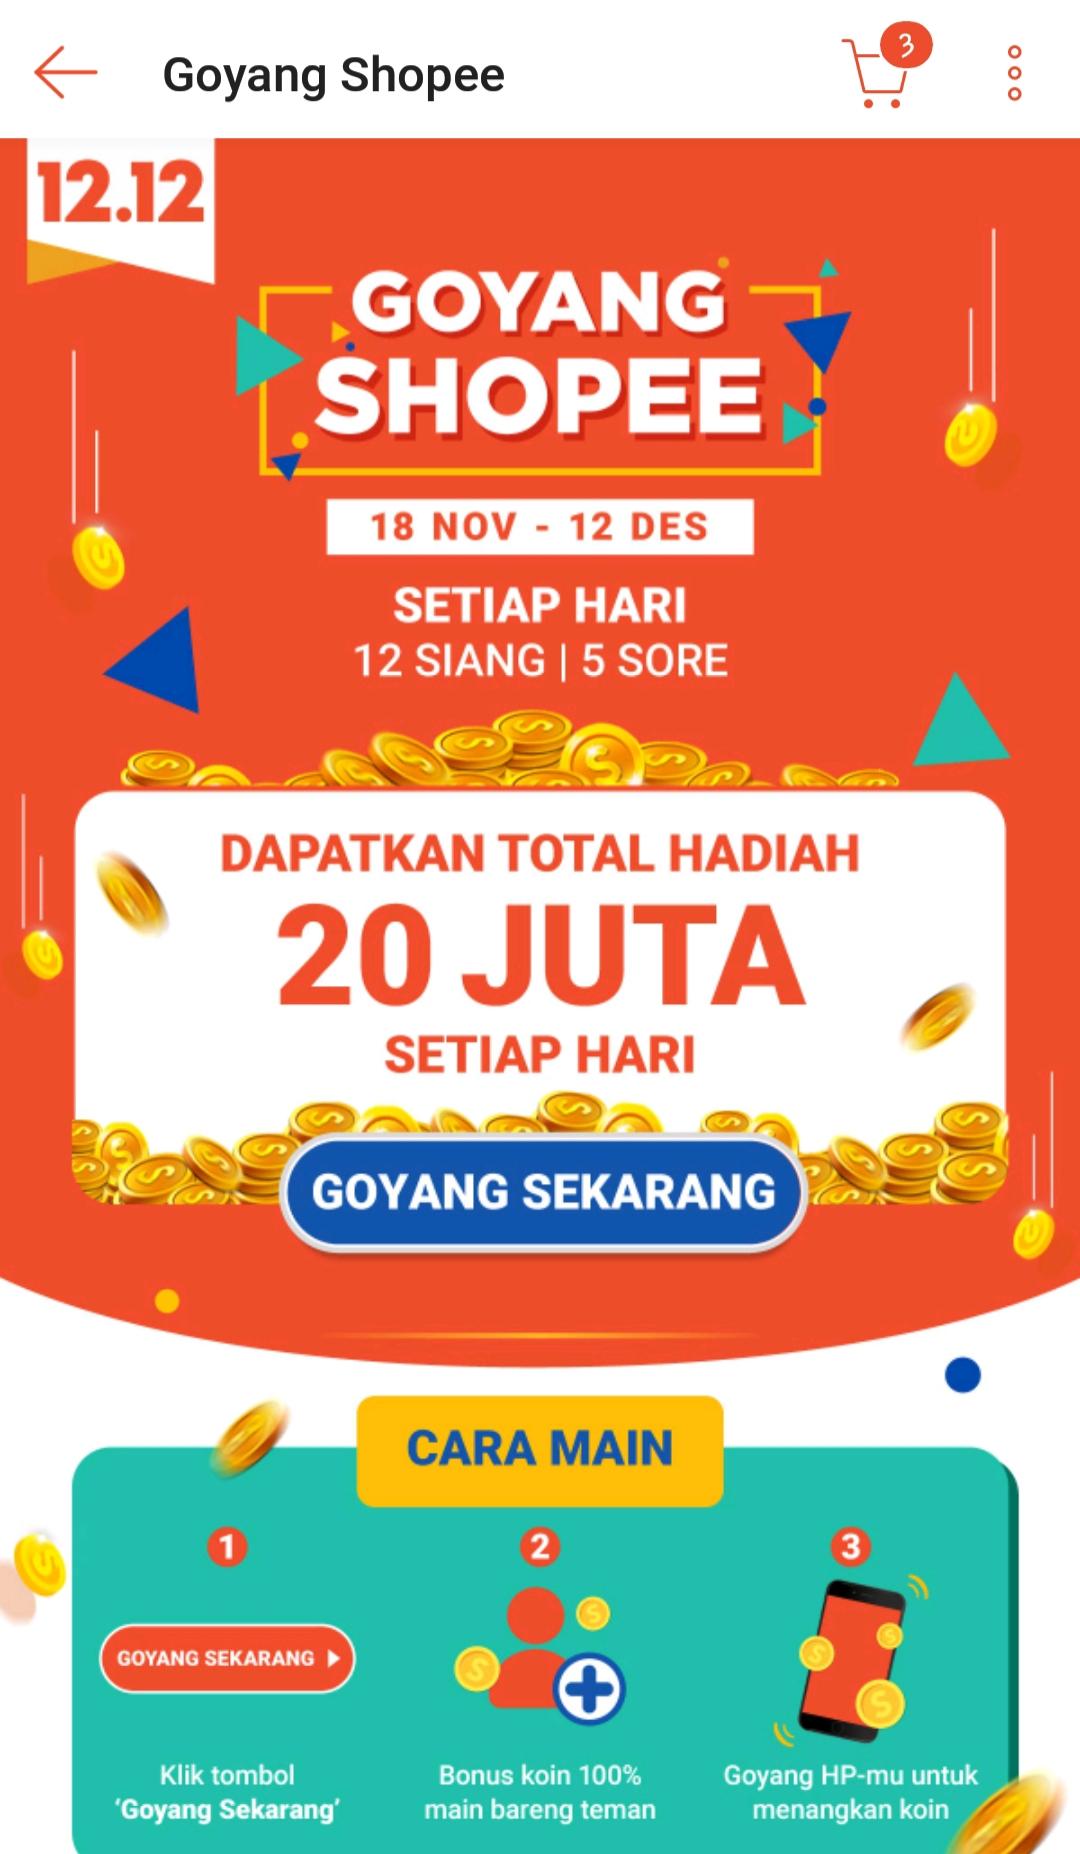 Shopee Games Terbaru Goyang Shopee